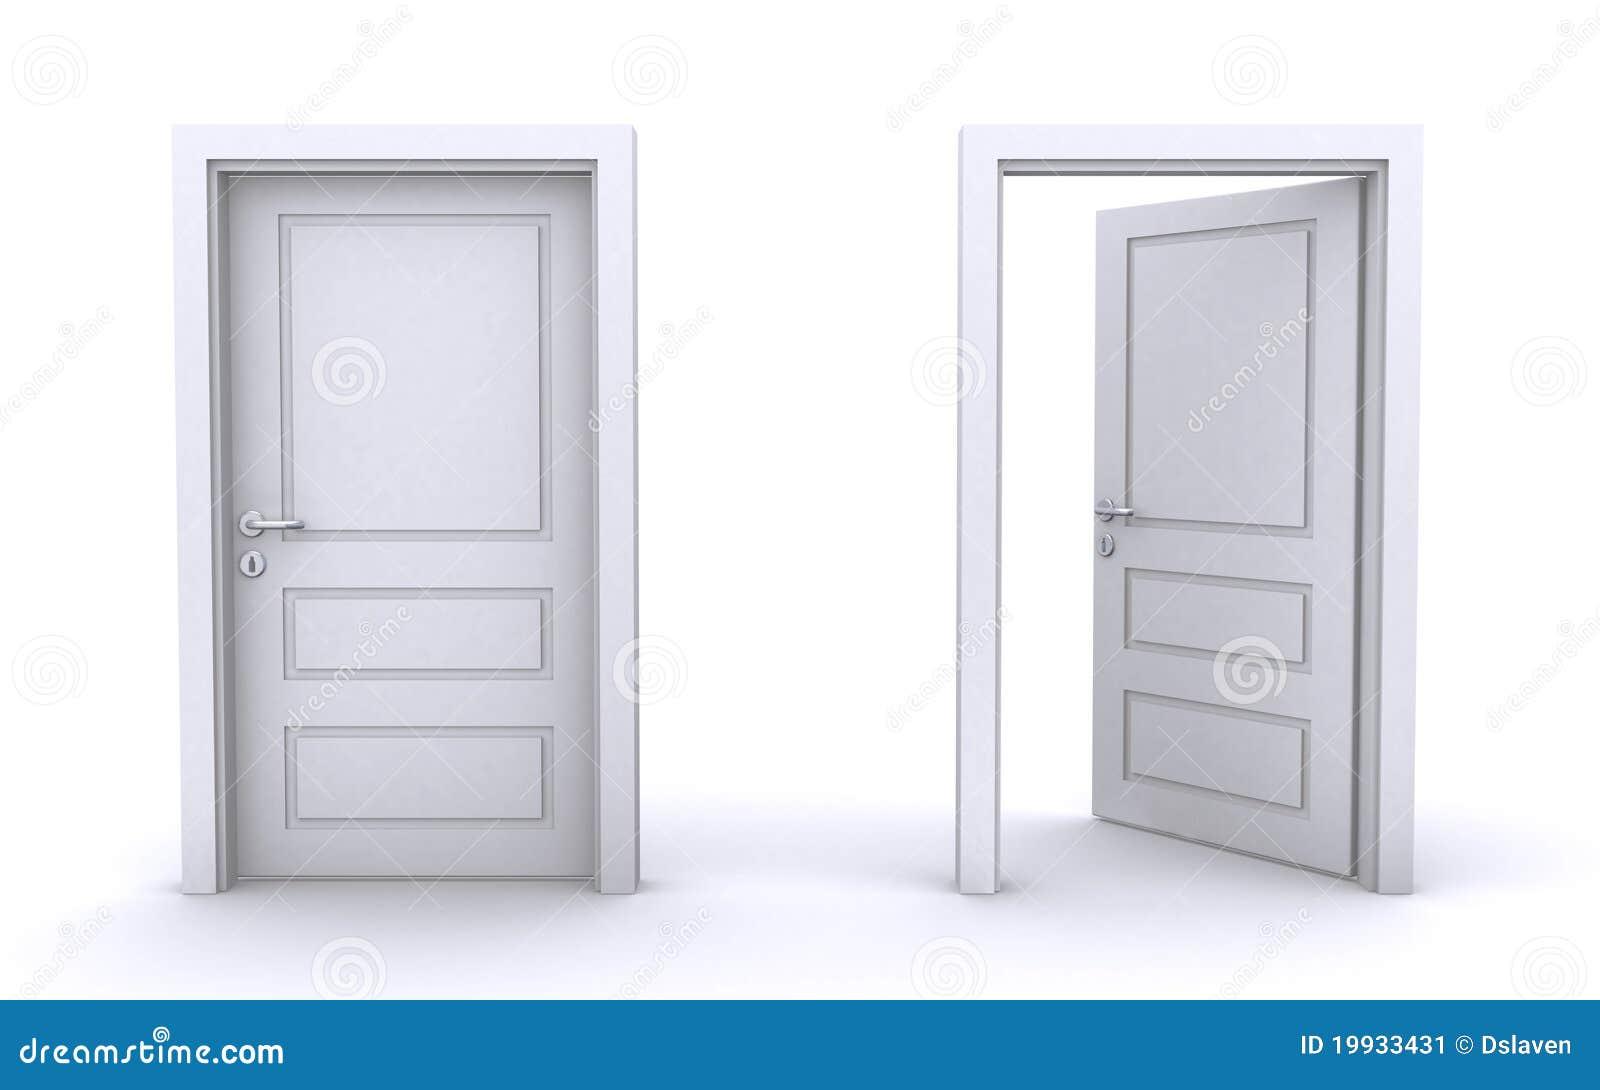 Geschlossene tür  Geöffnete Und Geschlossene Türen Stockbild - Bild: 19933431